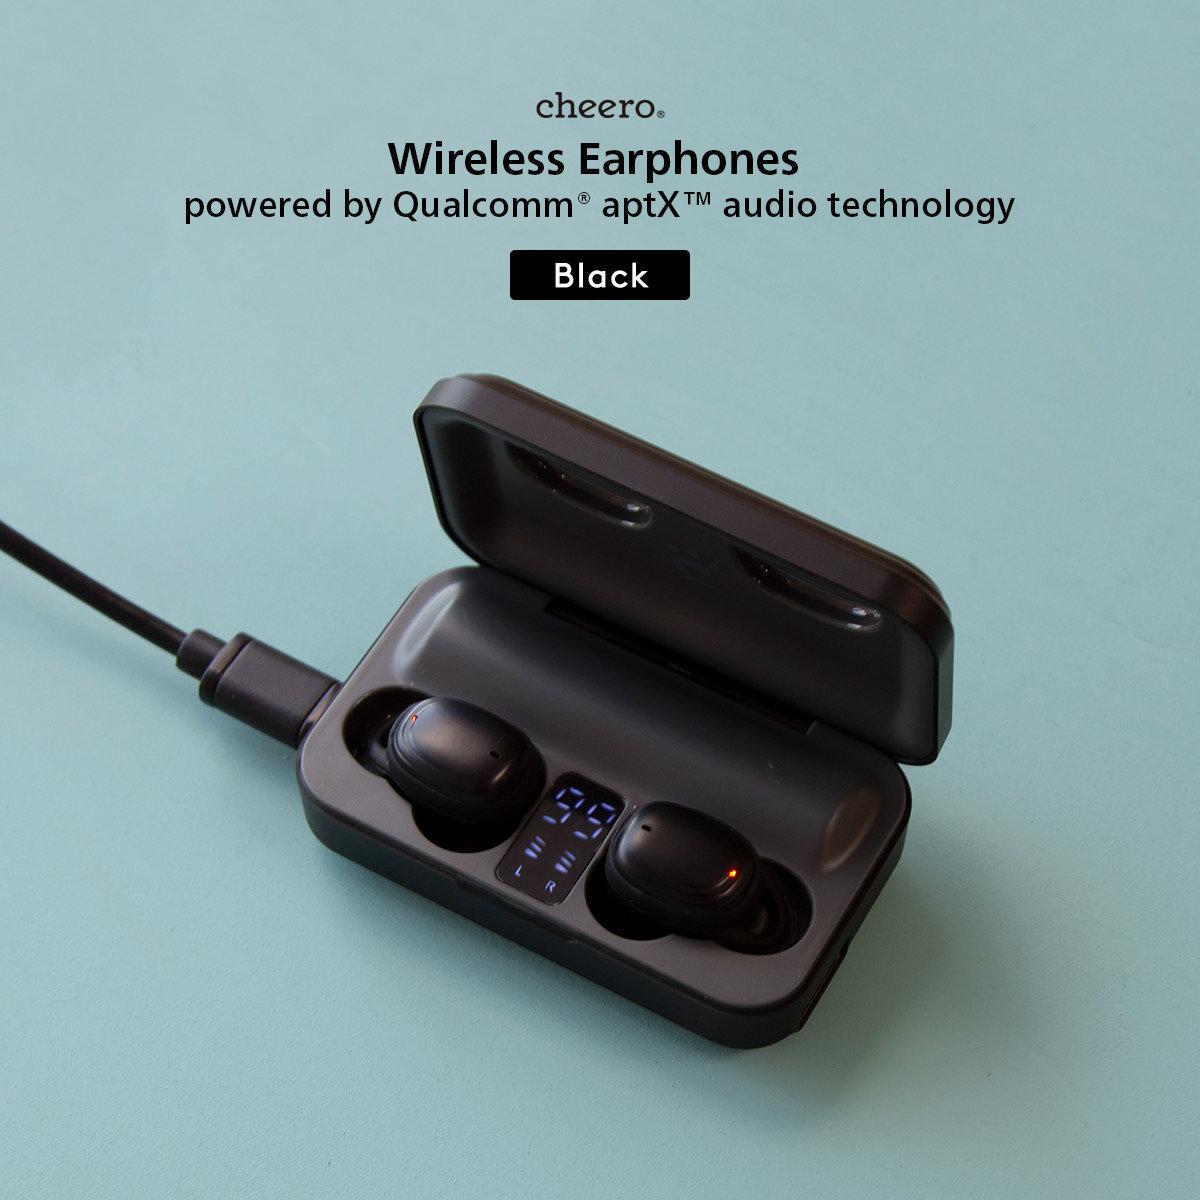 True wireless earphone powered by Qualcomm - Black (AAC/ aptX / BT5.1/ 2200mAh / IPX5)